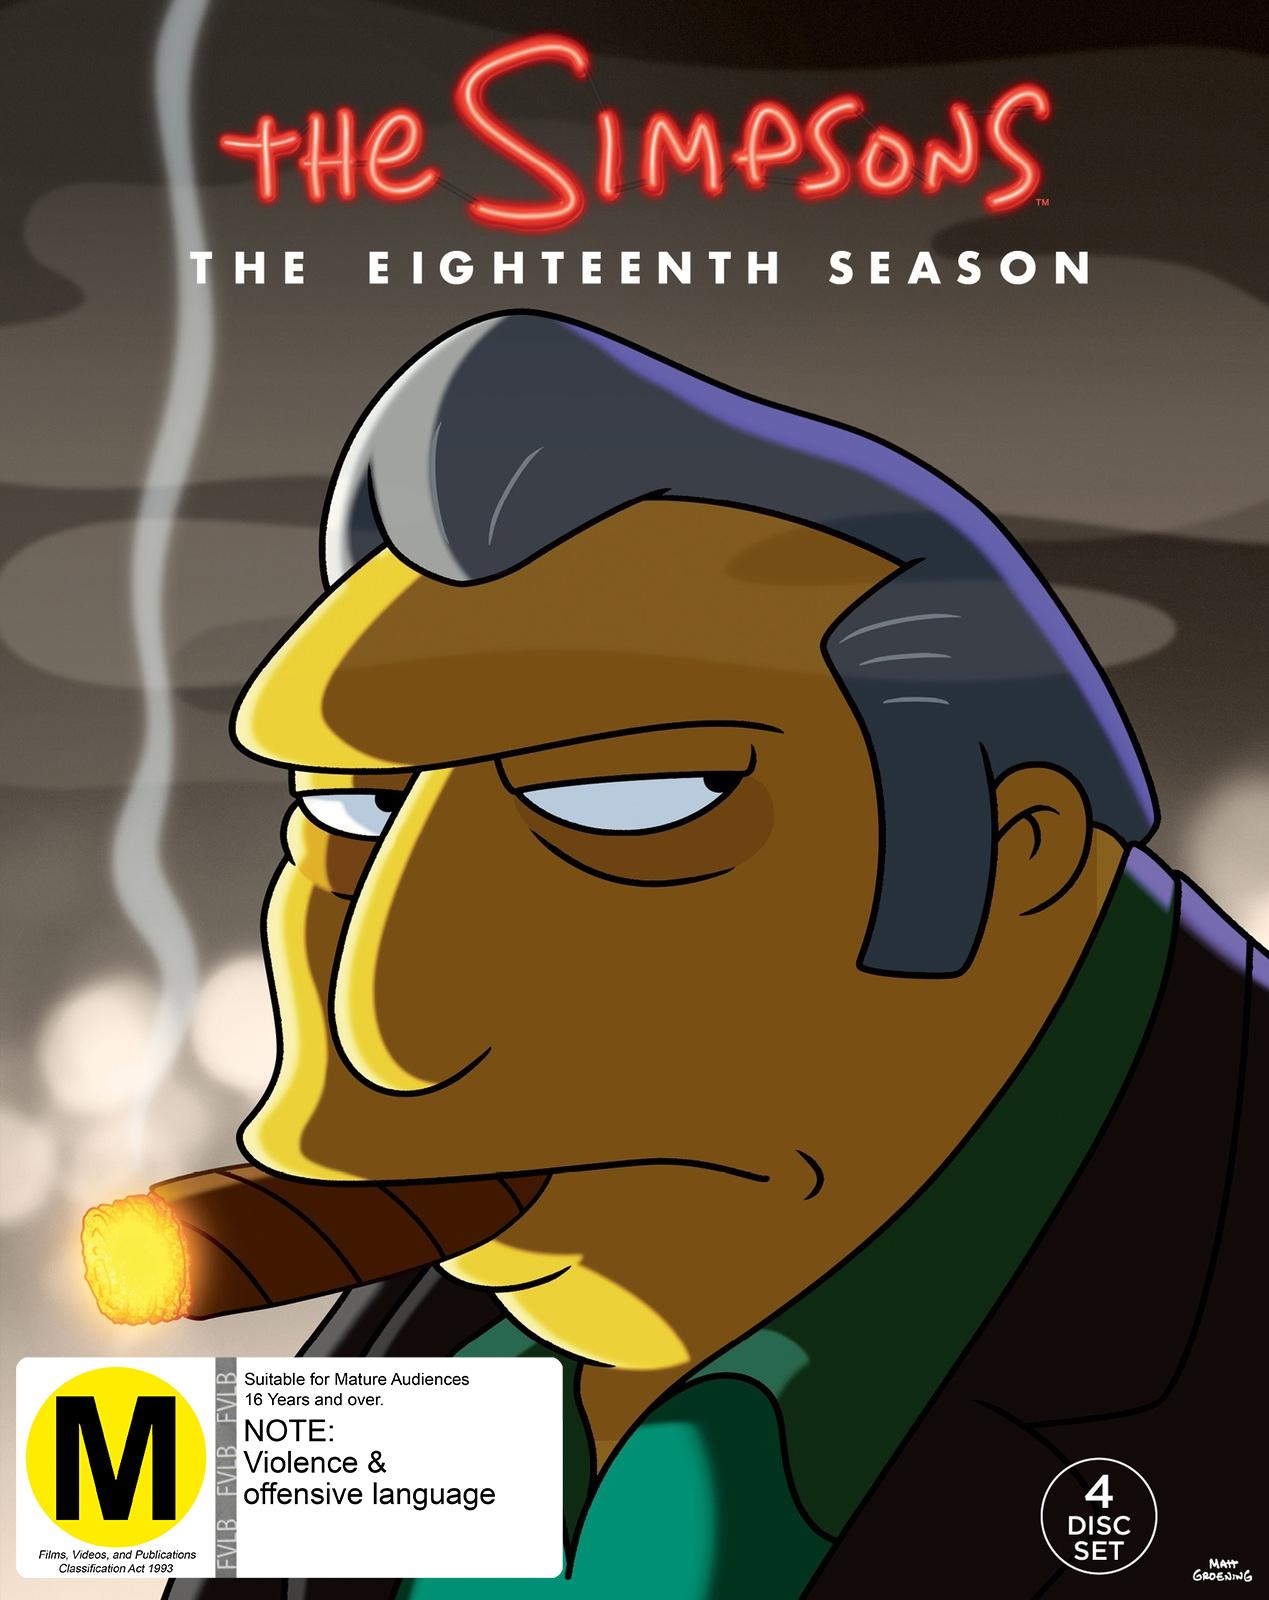 Simpsons - Season 18 (4 Disc Set) on DVD image